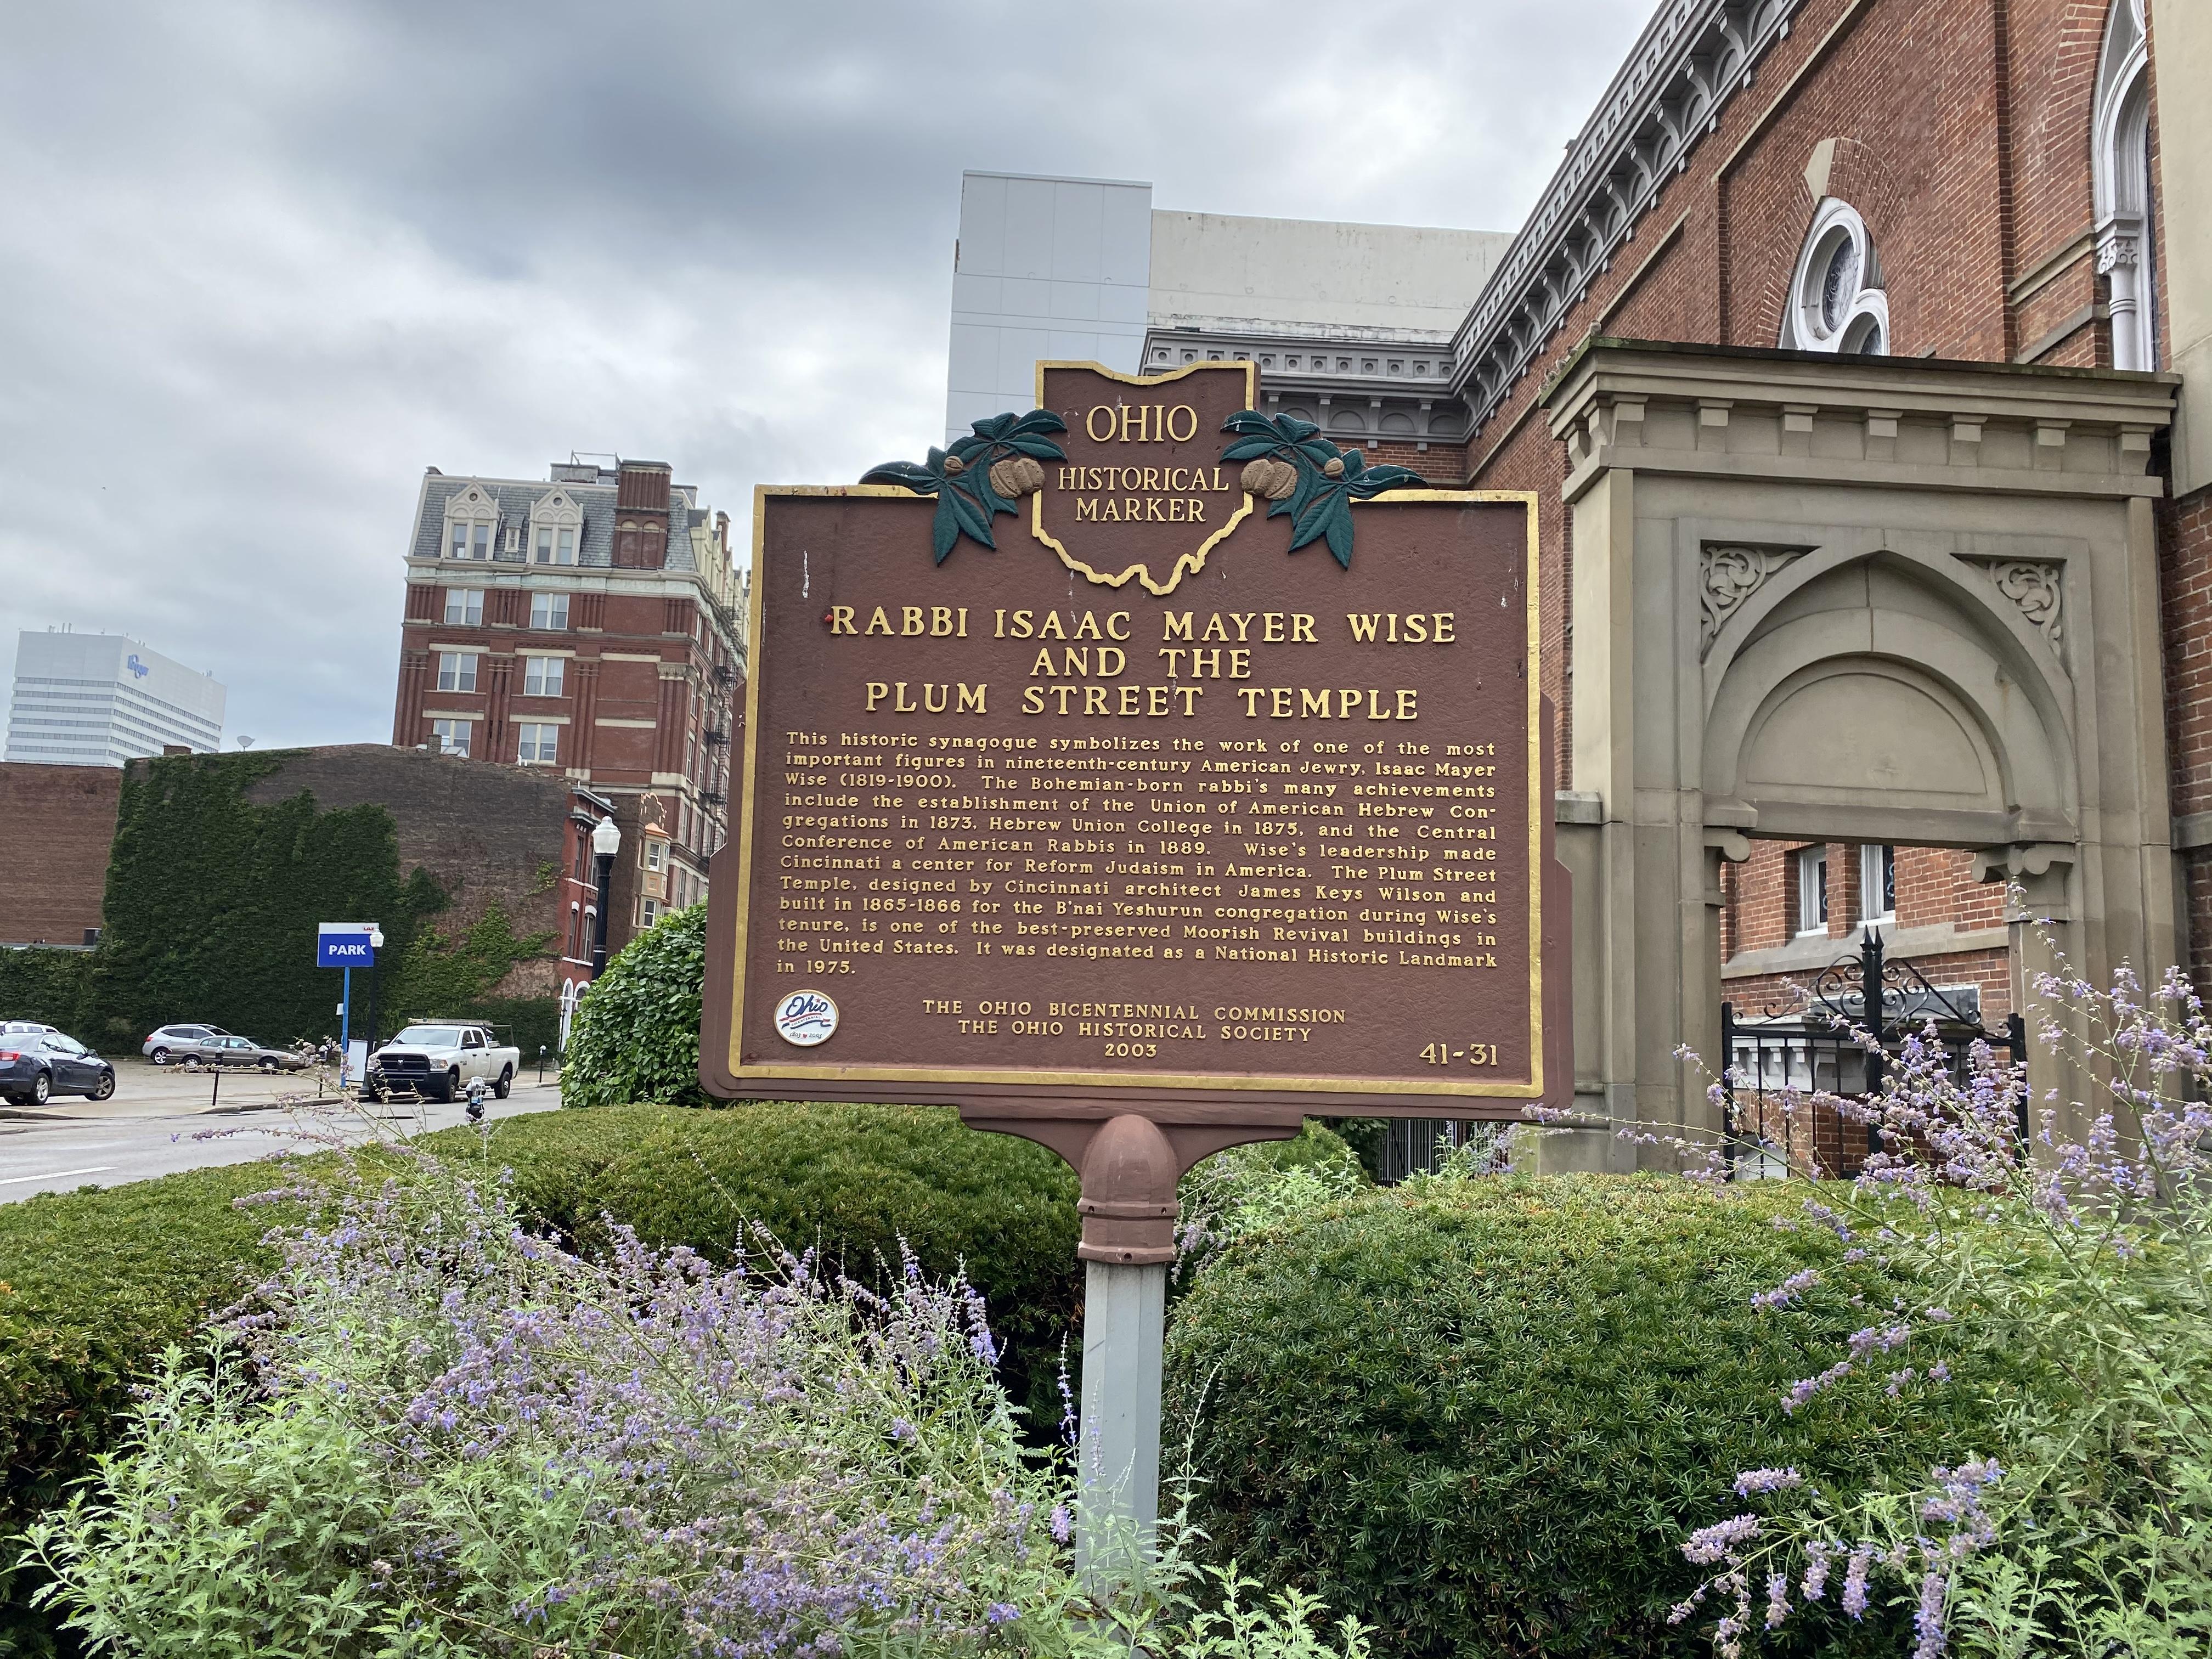 Historical Marker for Plum Street Temple